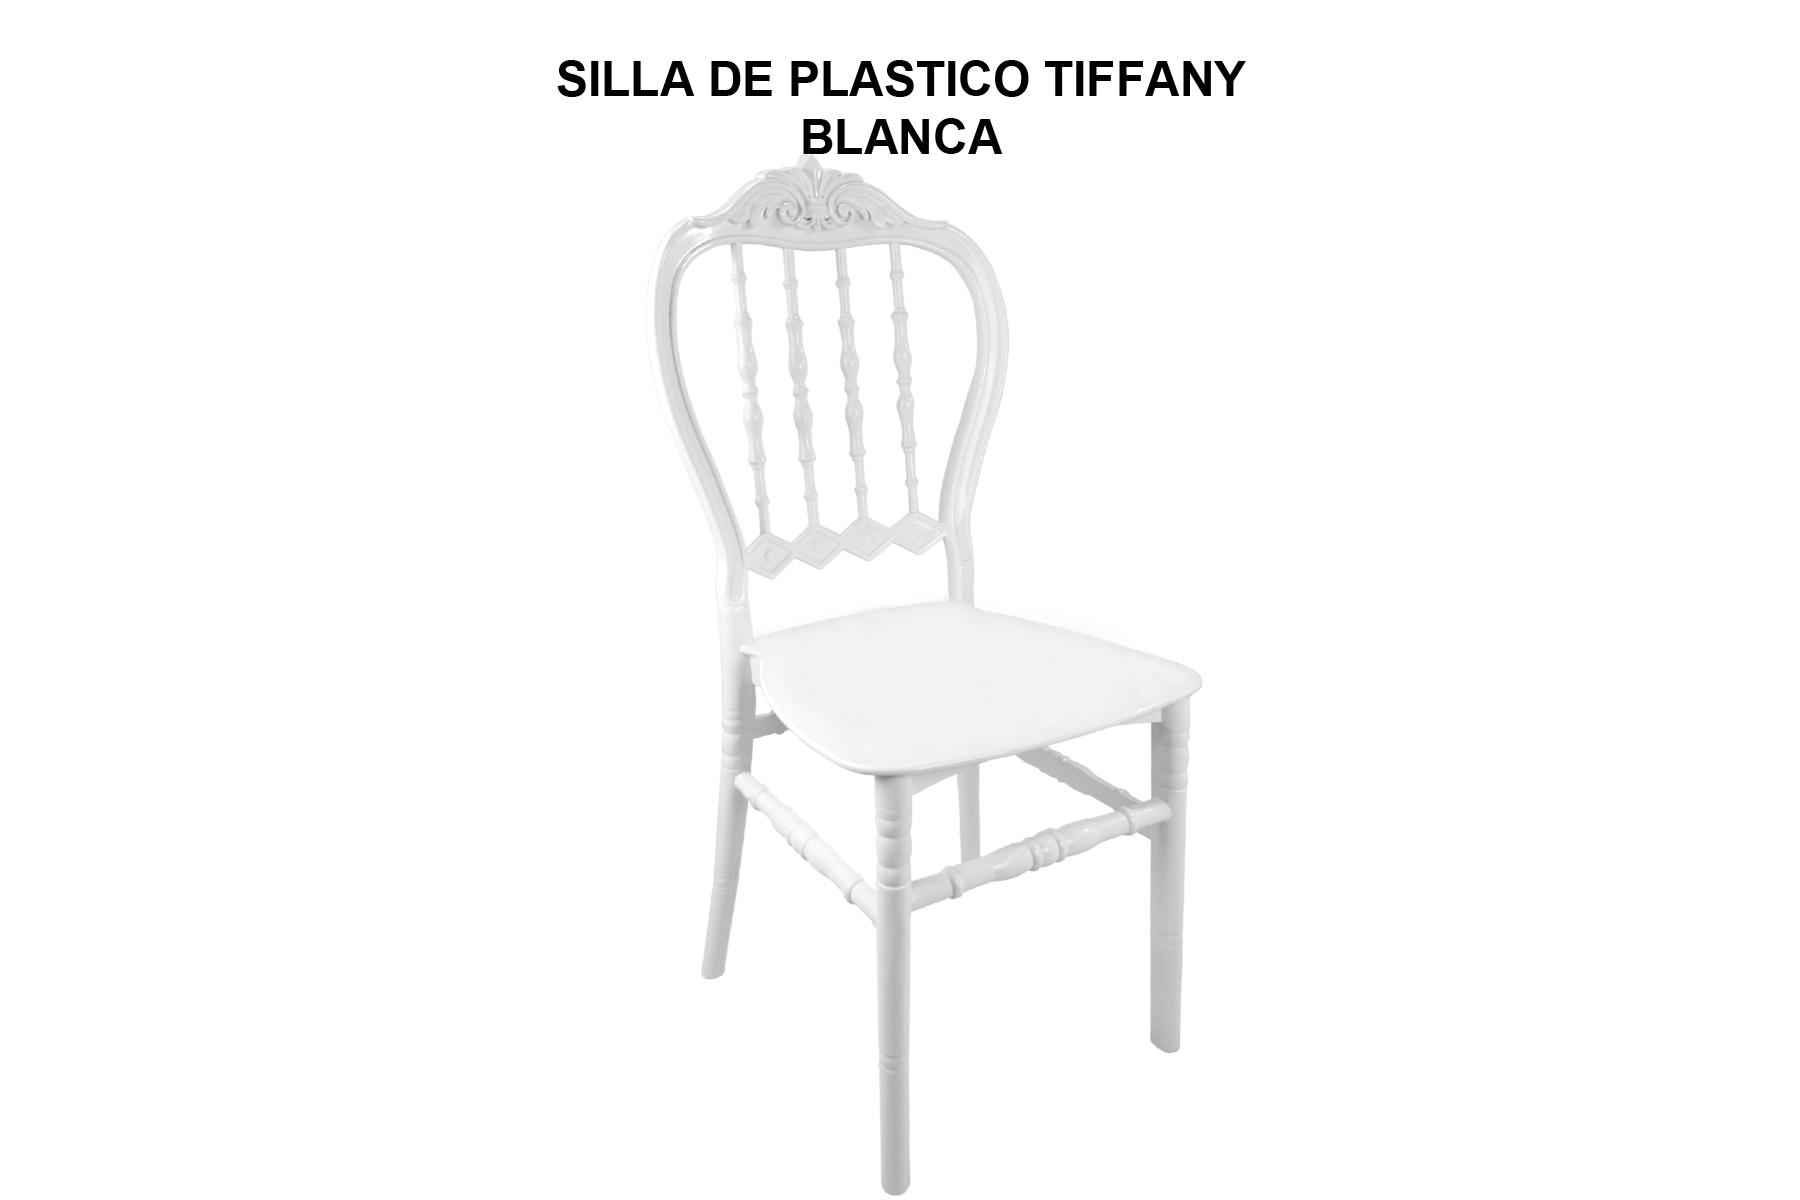 SILLA DE PLASTICO TIFFANY BLANCA